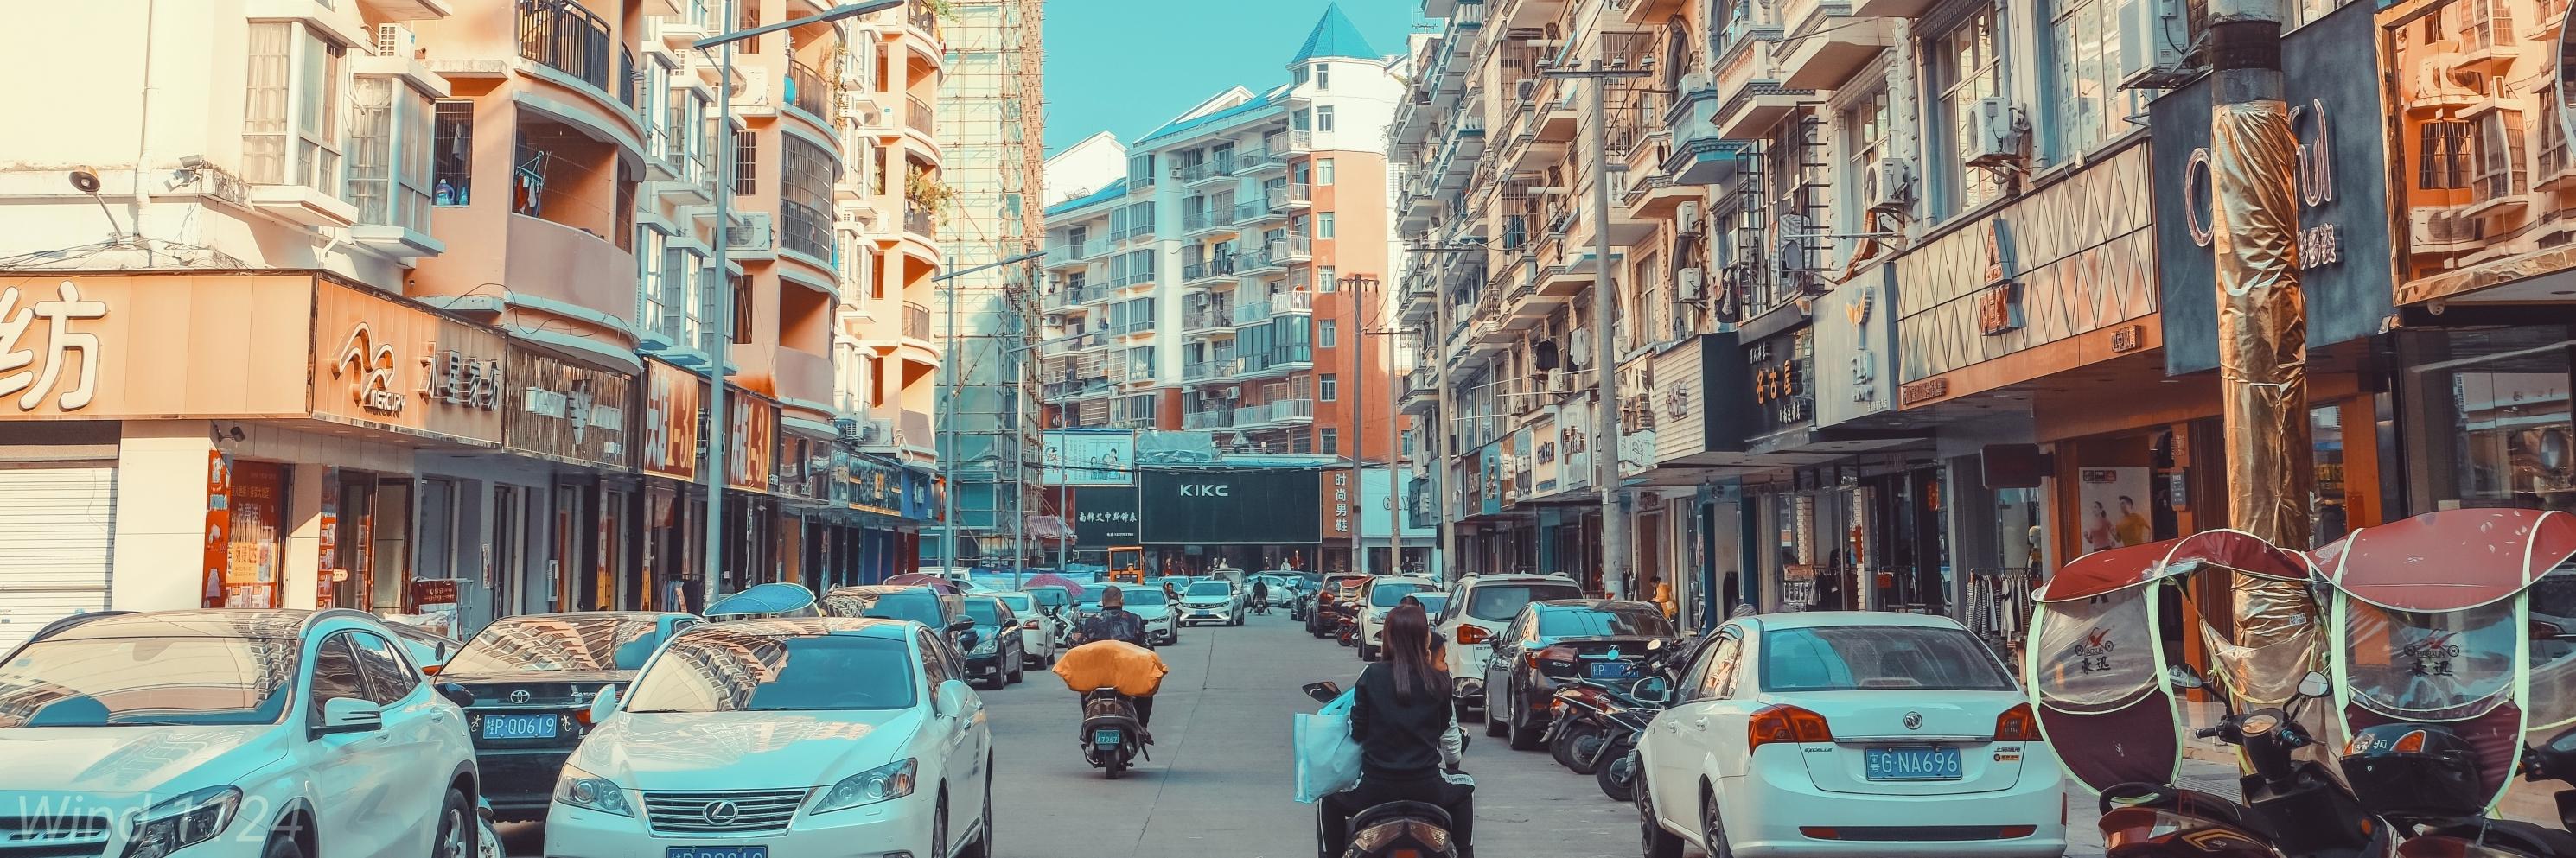 https://gody.vn/blog/tuananhhunre9193/post/review-chuyen-vuot-bien-02-ngay-tai-dong-hung-trung-quoc-5915